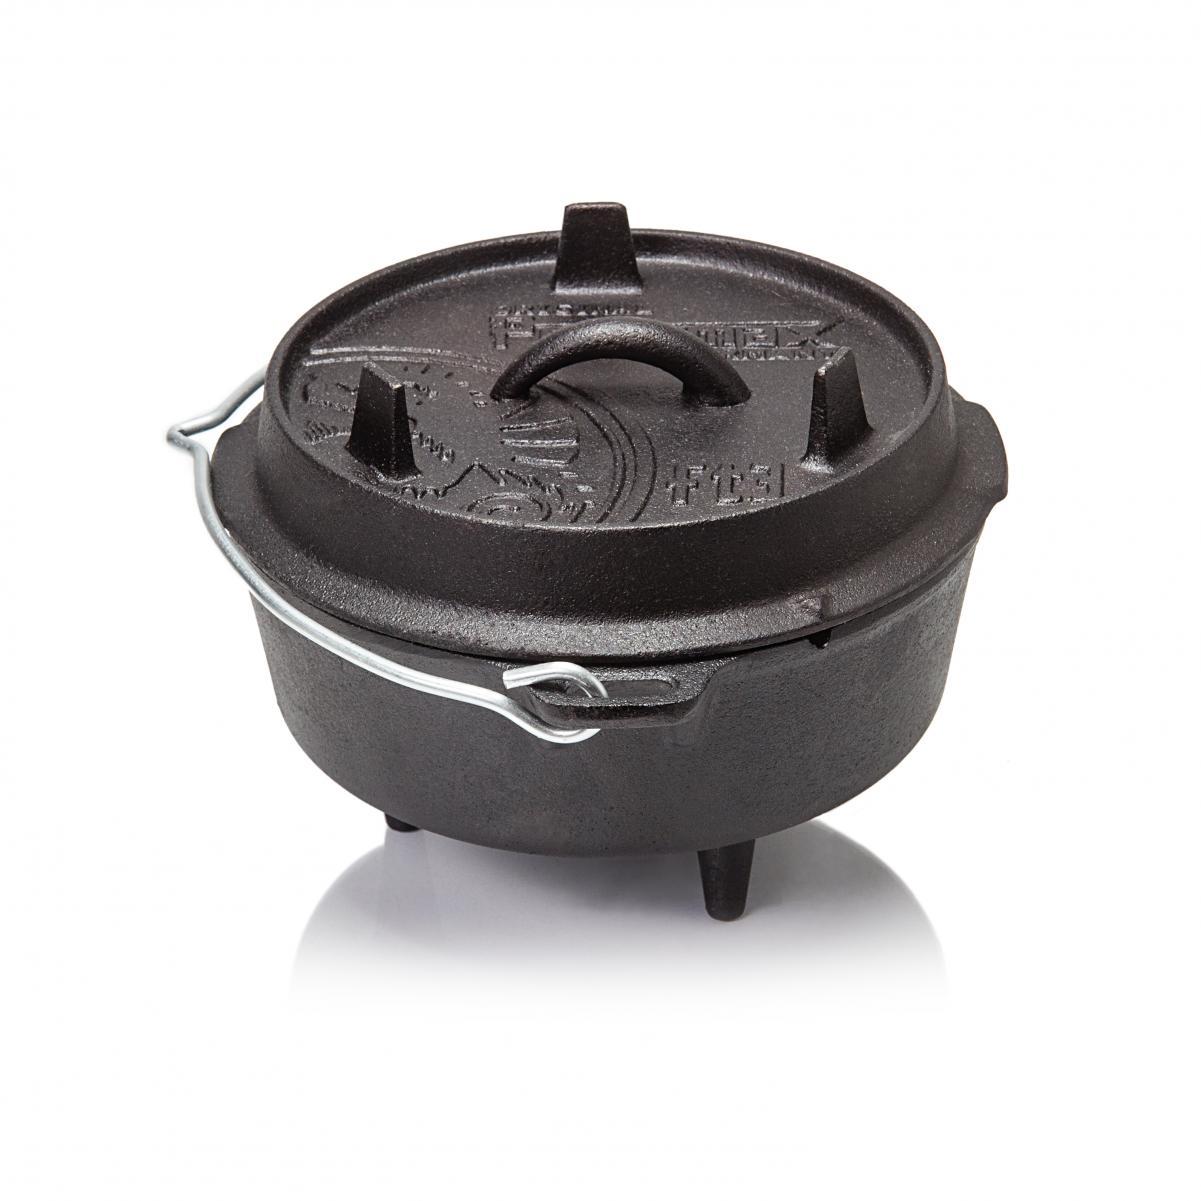 Petromax Dutch Oven ft3 ohne Füße